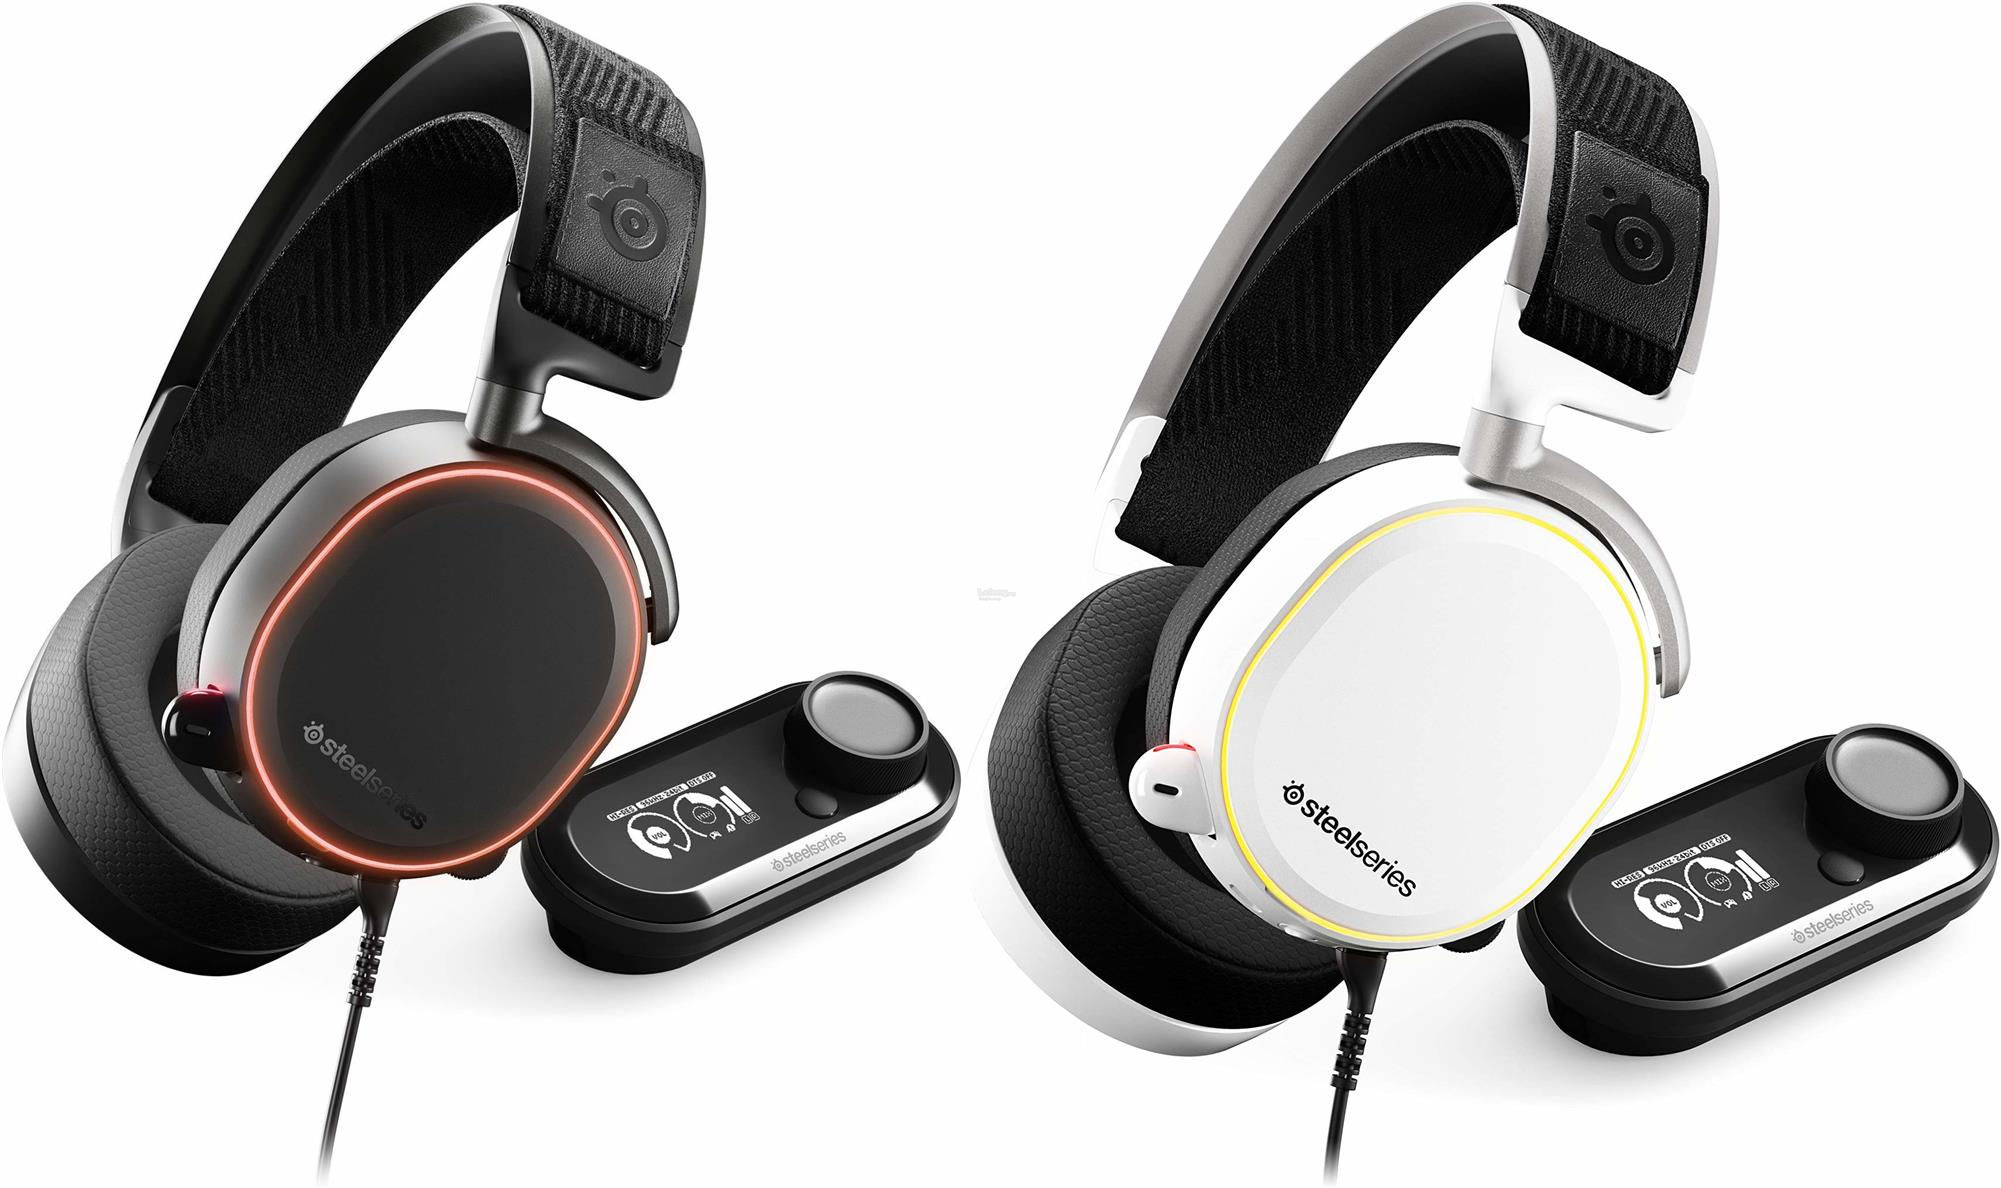 # STEELSERIES Arctis Pro + GameDAC RGB Gaming Headset #